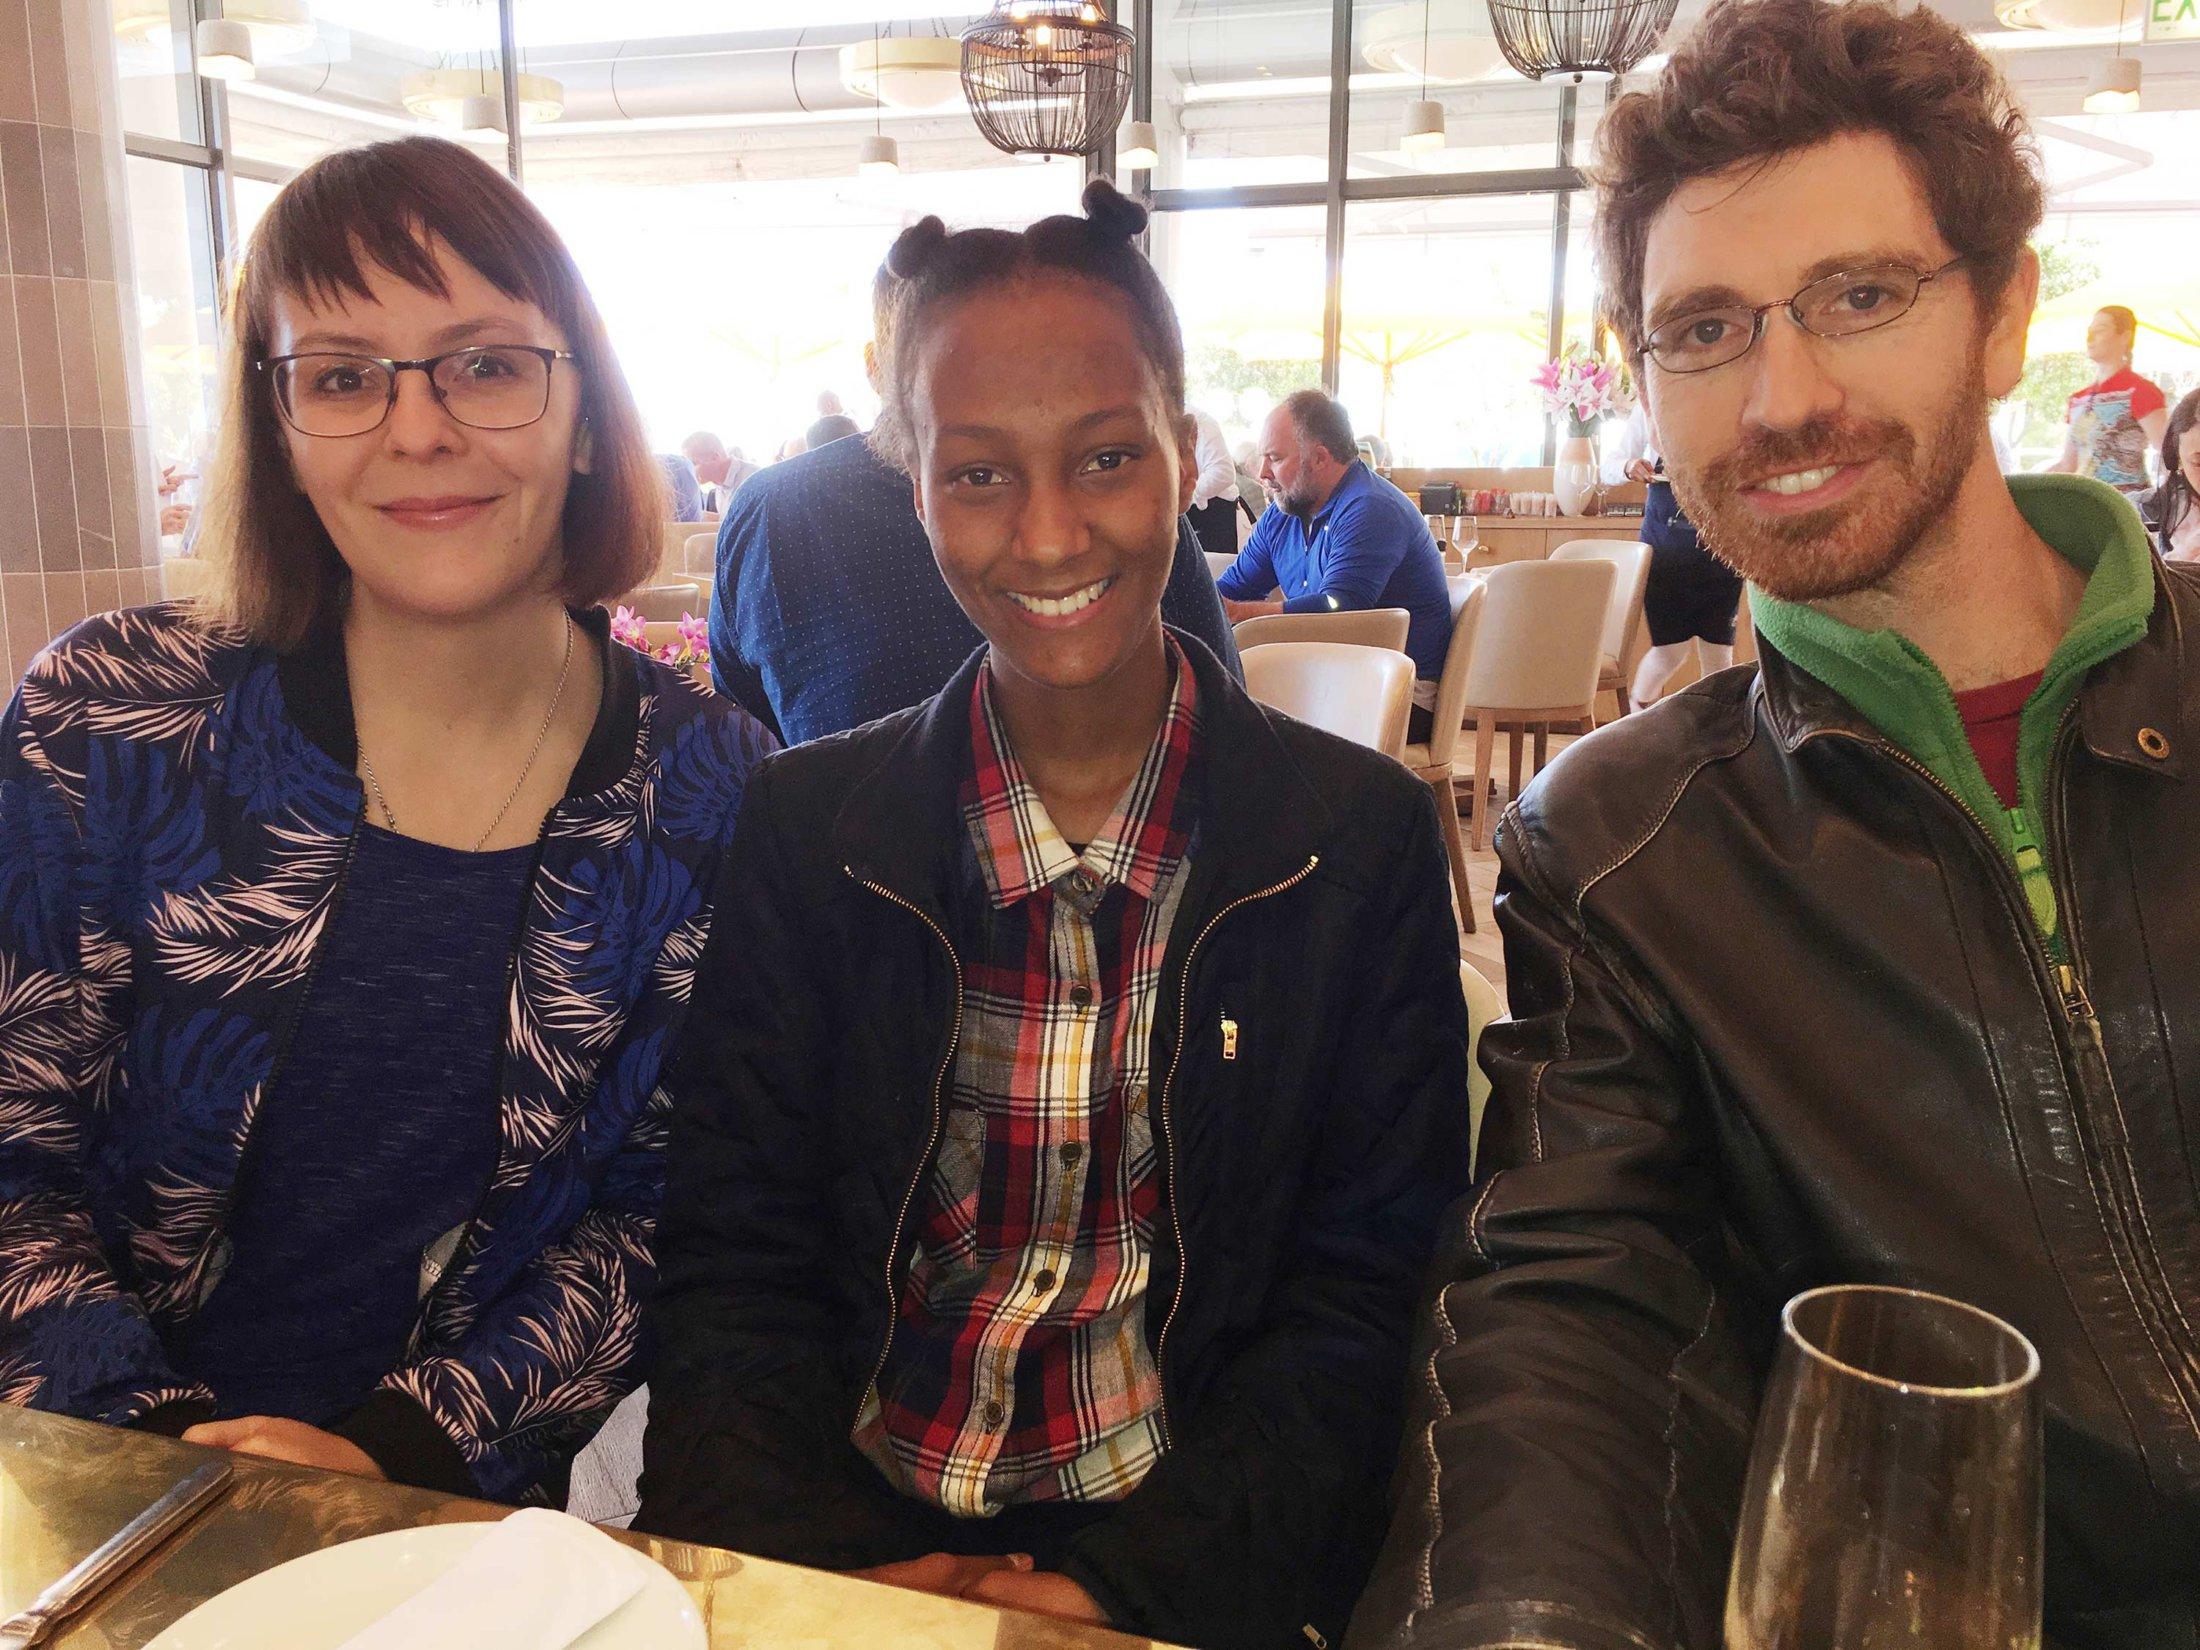 Caro, Alyssa and Simon. Celebrating Alyssa Eksteen's birthday at Lily's in Mouille Point, Cape Town, 06/10/2017.